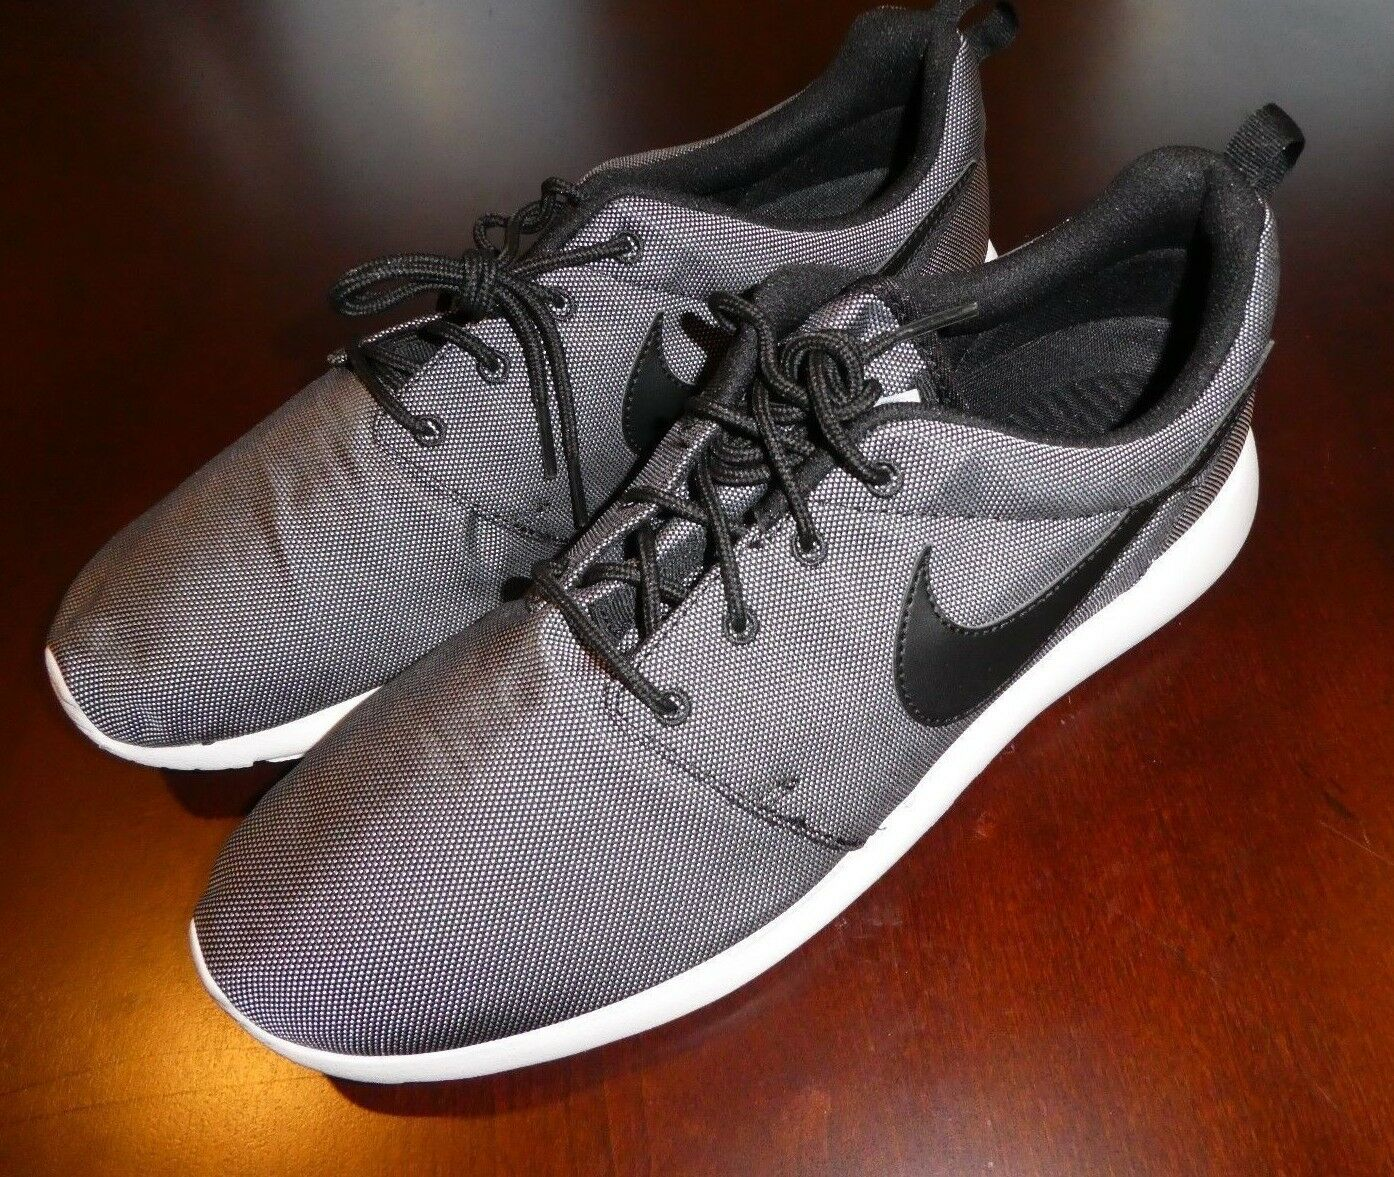 Nike tanjun basso in scarpe da ginnastica uomini scarpe river rock 812654-006 dimensioni nuove